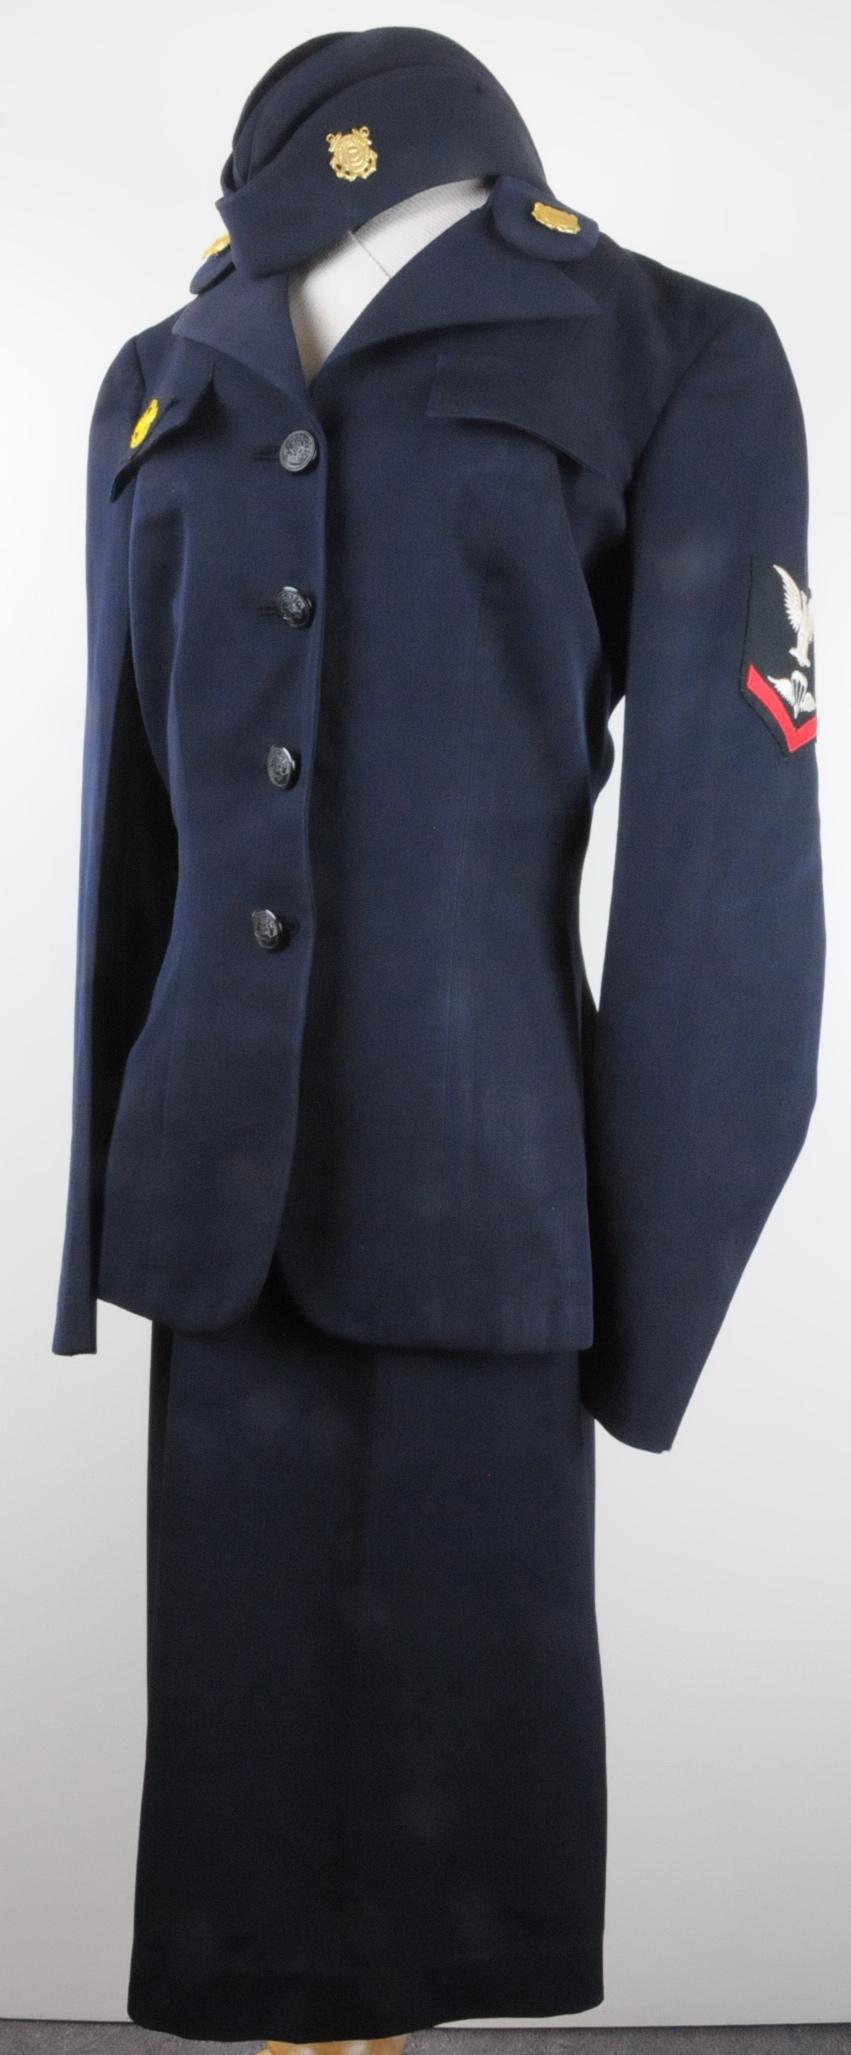 The SPAR uniform of Dolores (Denfeld) Schubilske.  She was a Parachute Rigger, Third Class.  Uniform is now part of the Coast Guard's Artifact collection.